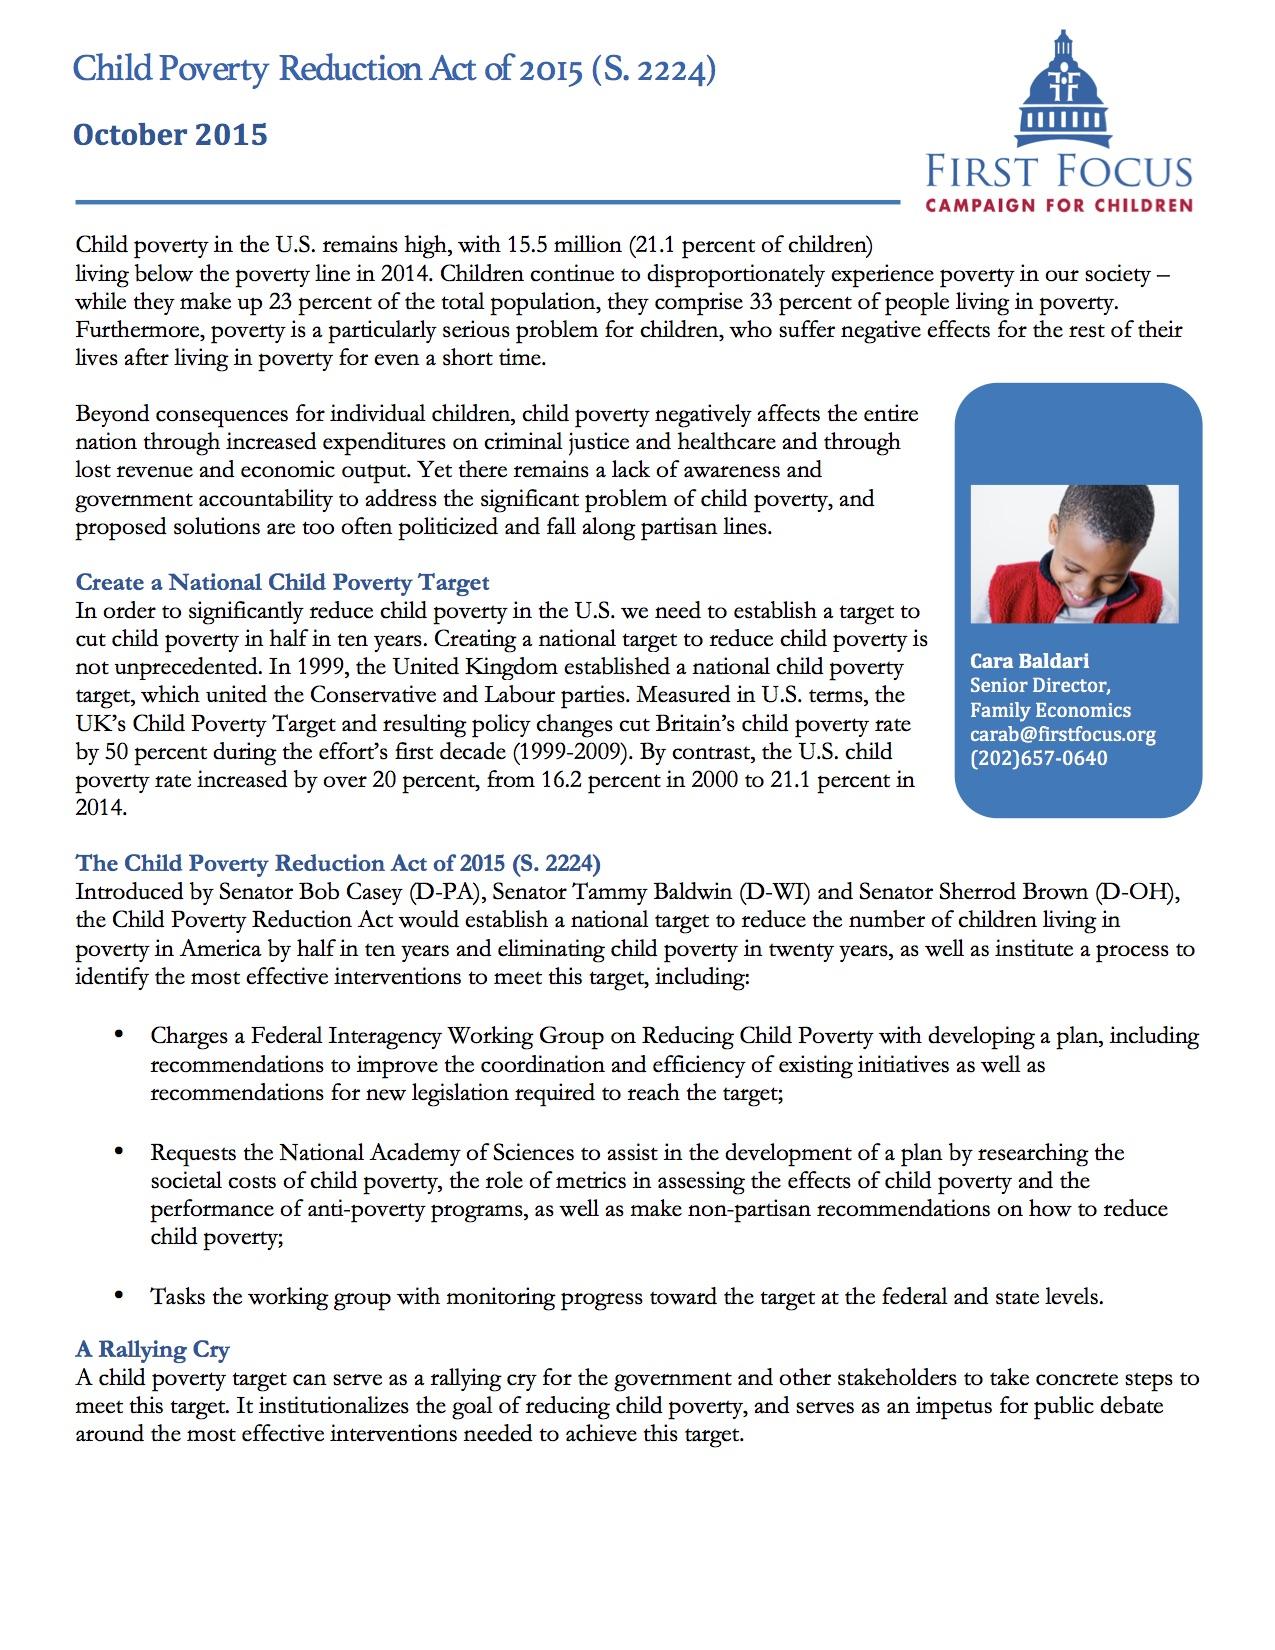 Child Poverty Reduction Act Fact Sheet - Senate version